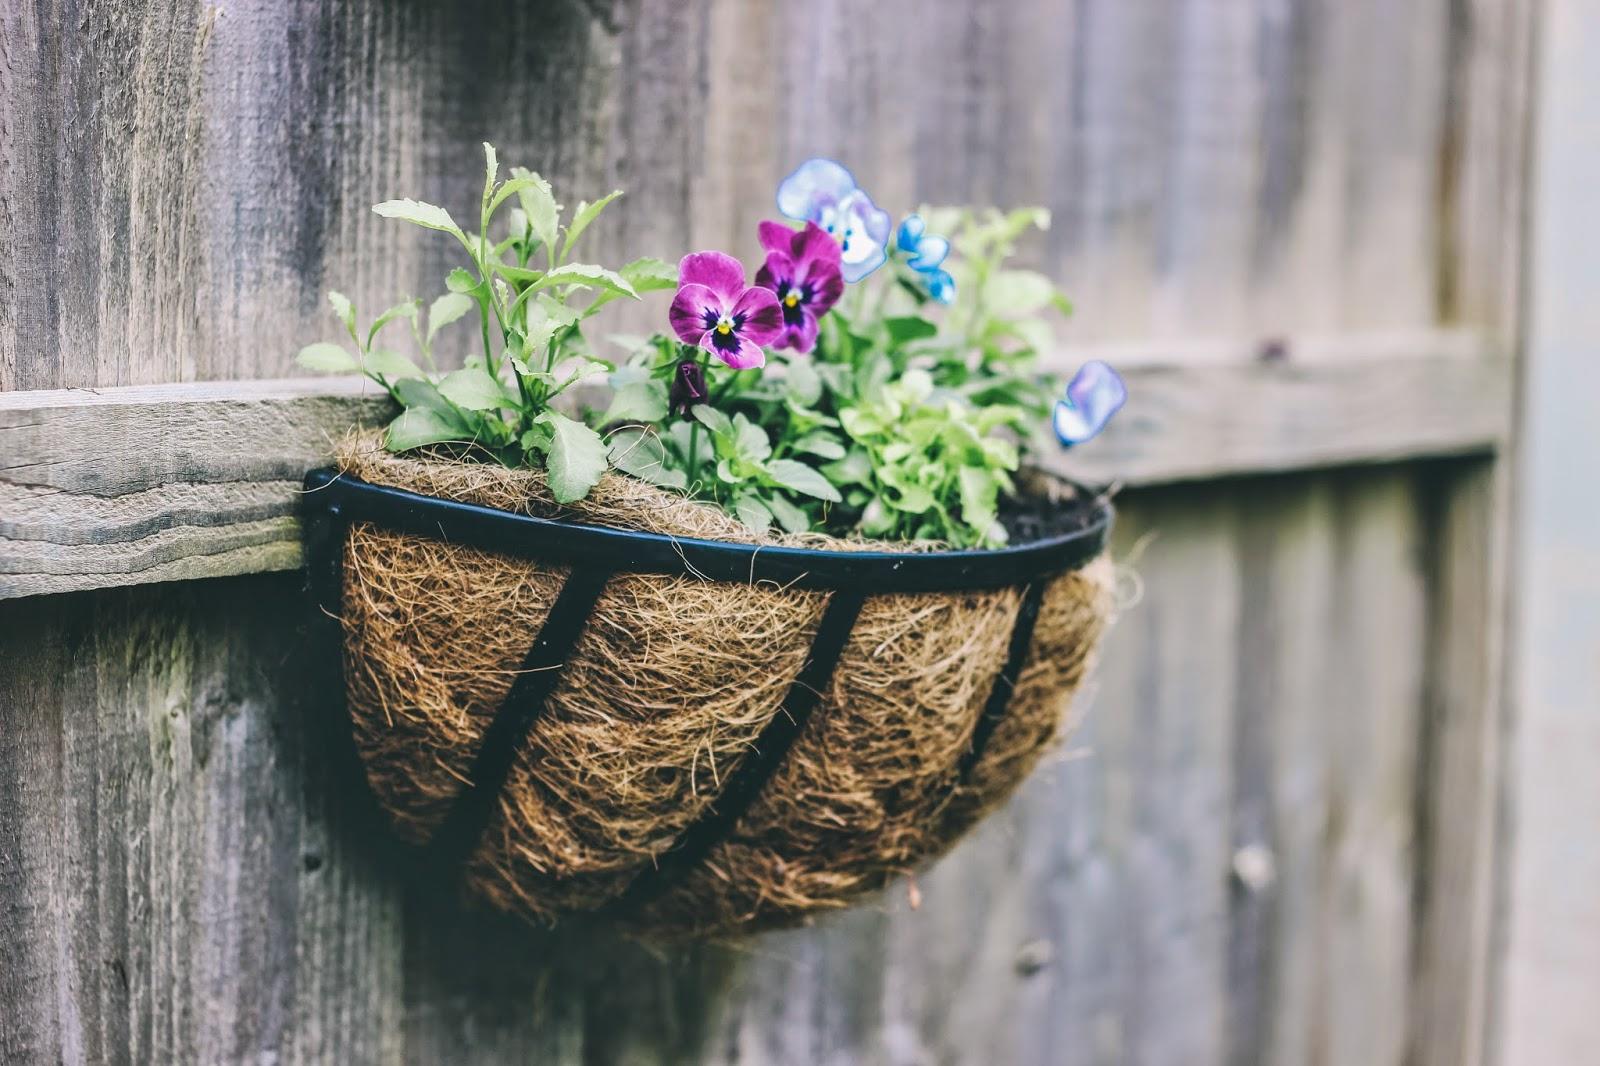 Pansies in basket - growing flowers in a small space